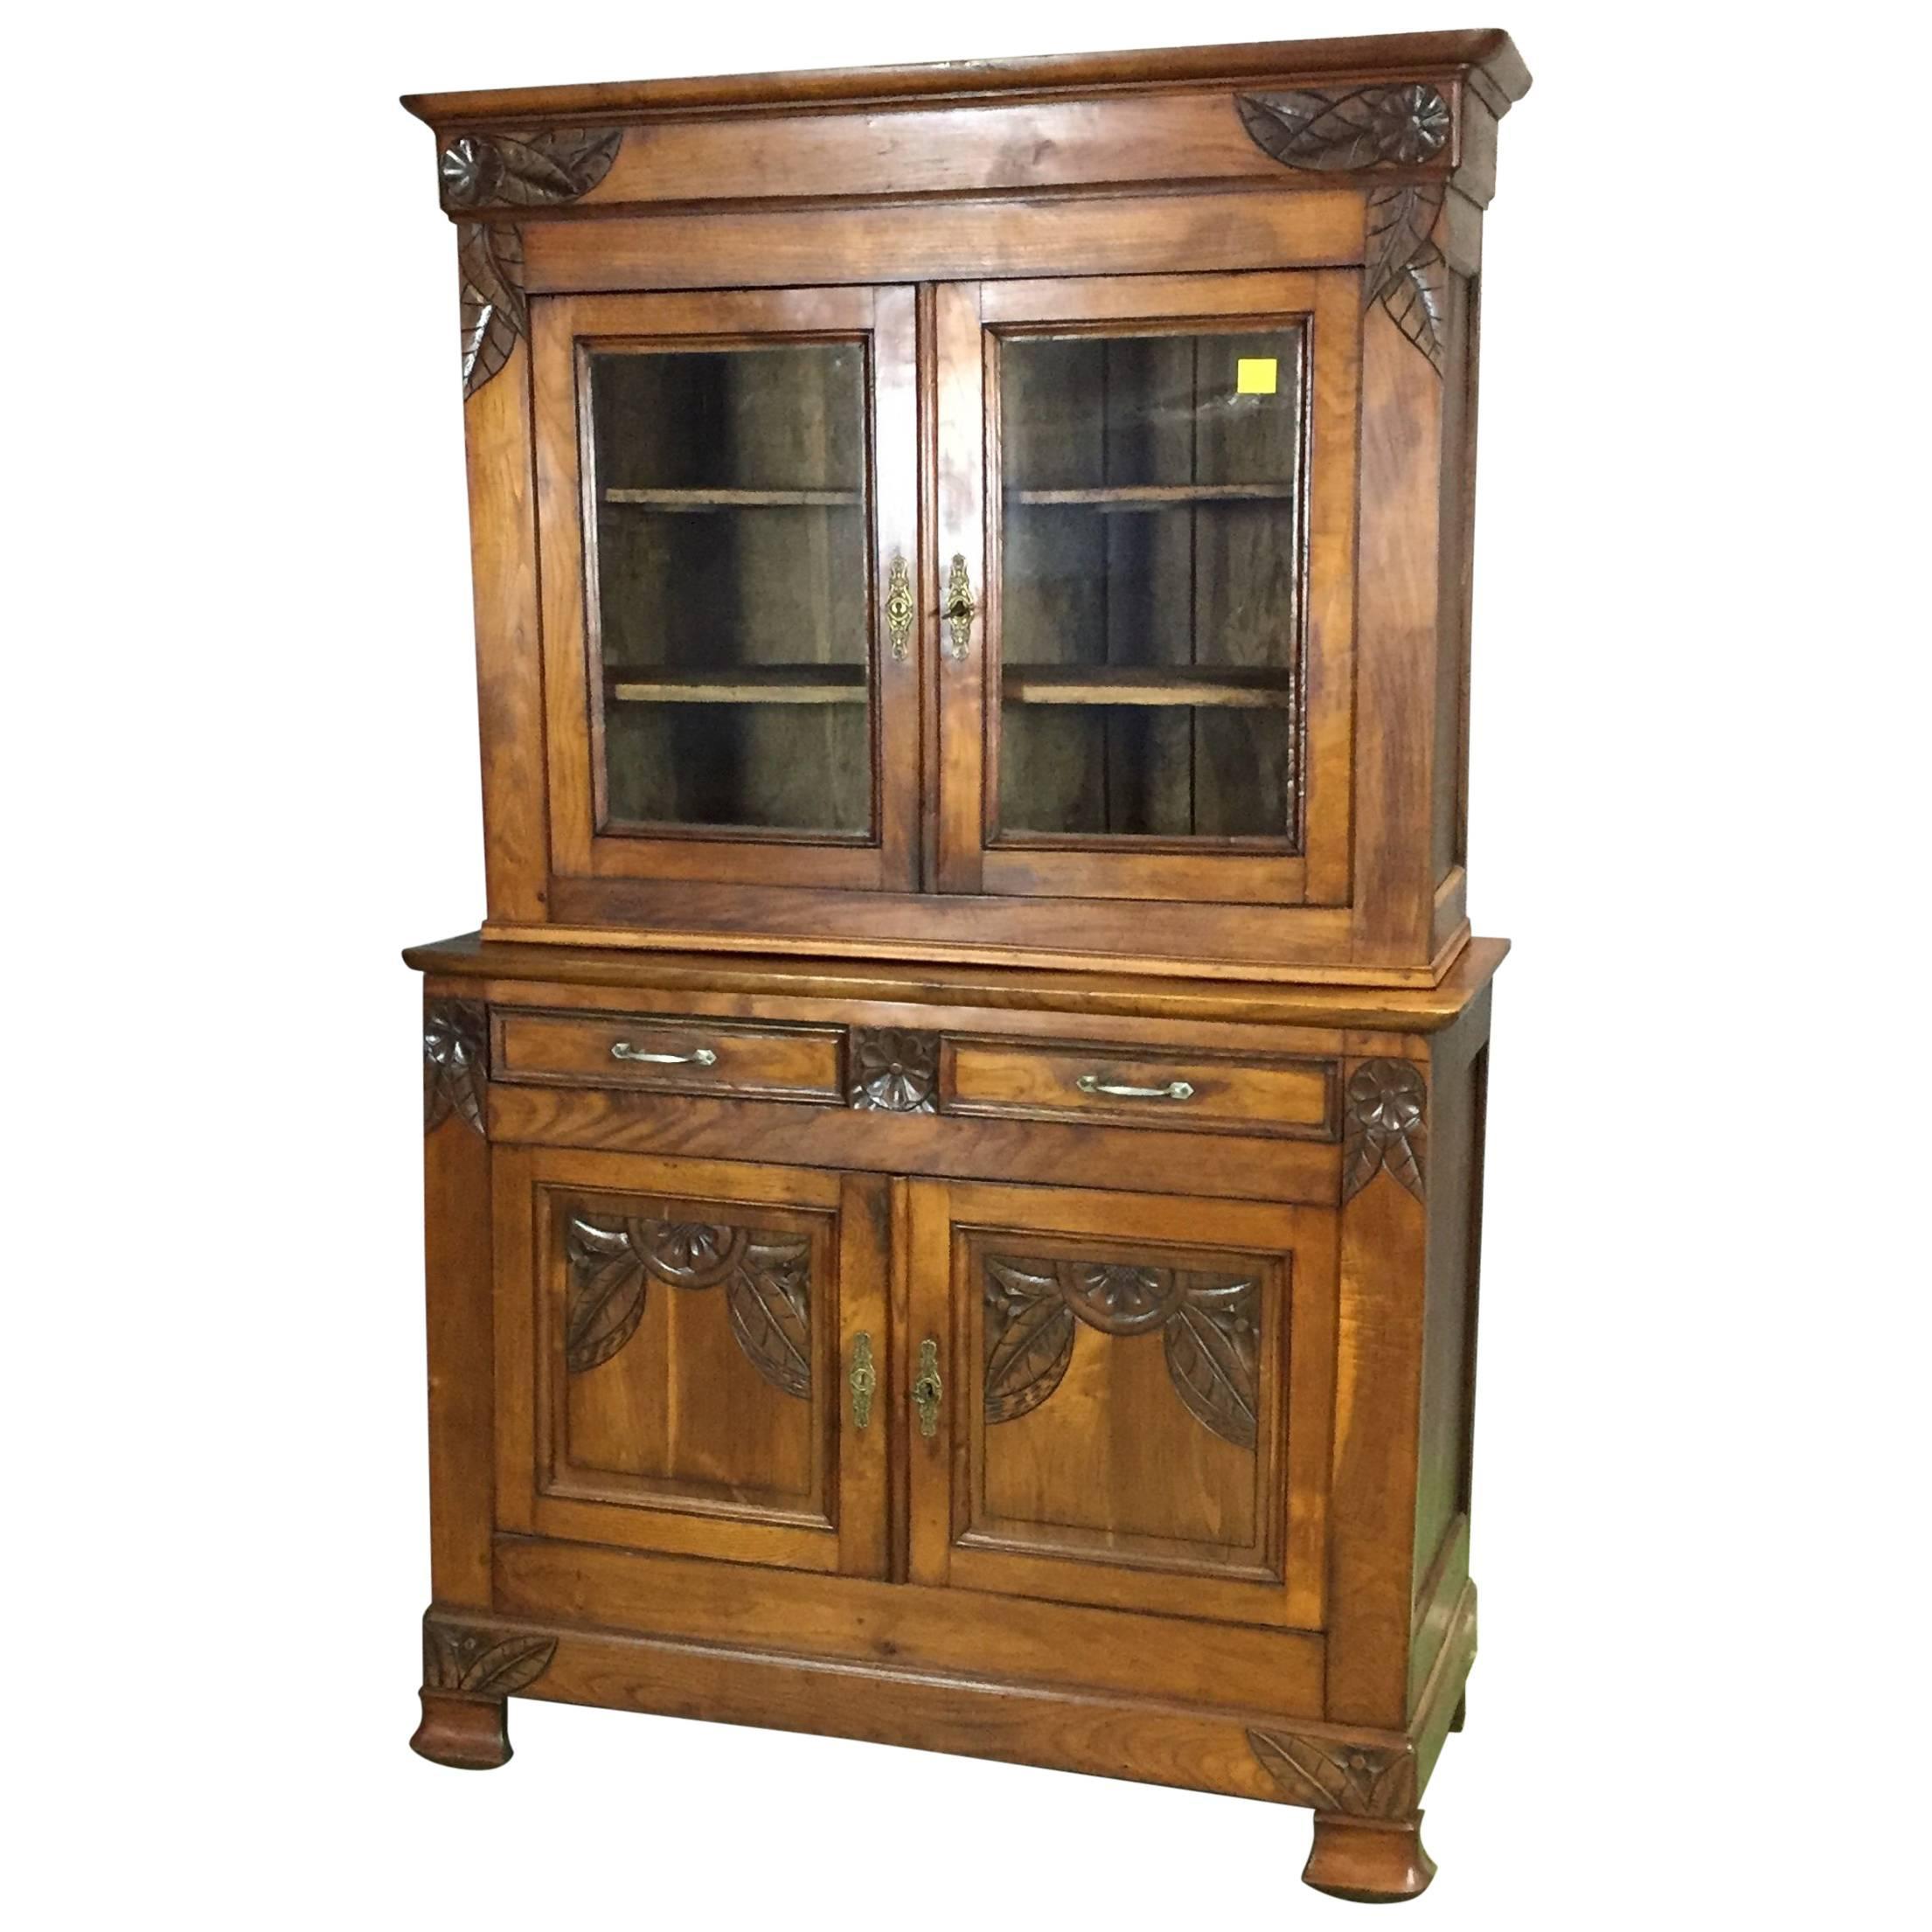 1930s Art Deco Chestnut Rustic Kitchen Buffet For Sale